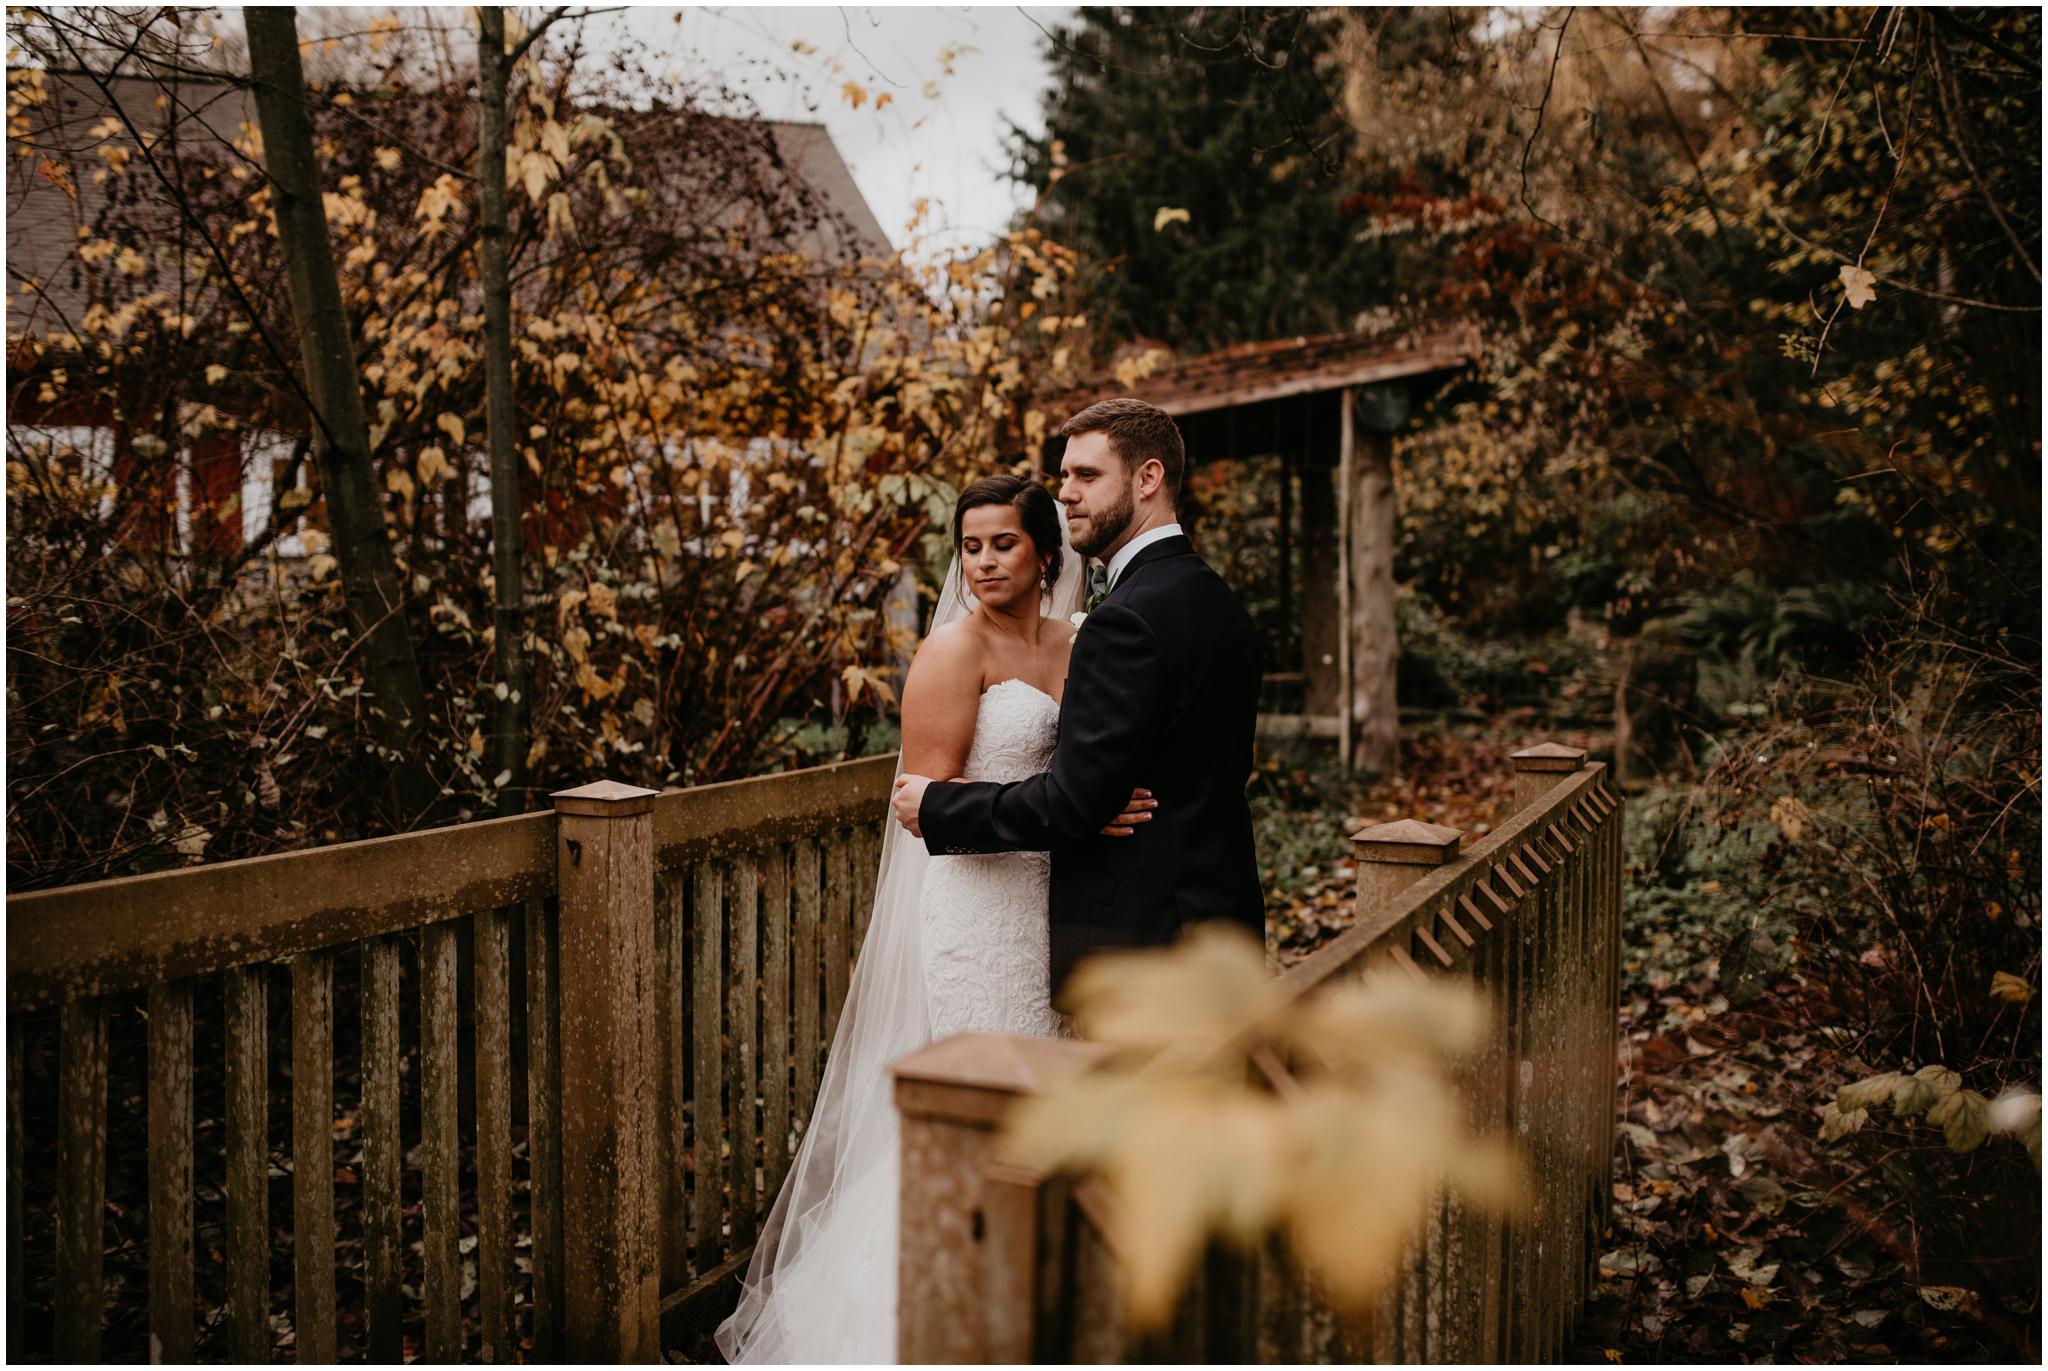 ashley-tj-the-pickering-barn-winter-wedding-seattle-photographer-051.jpg